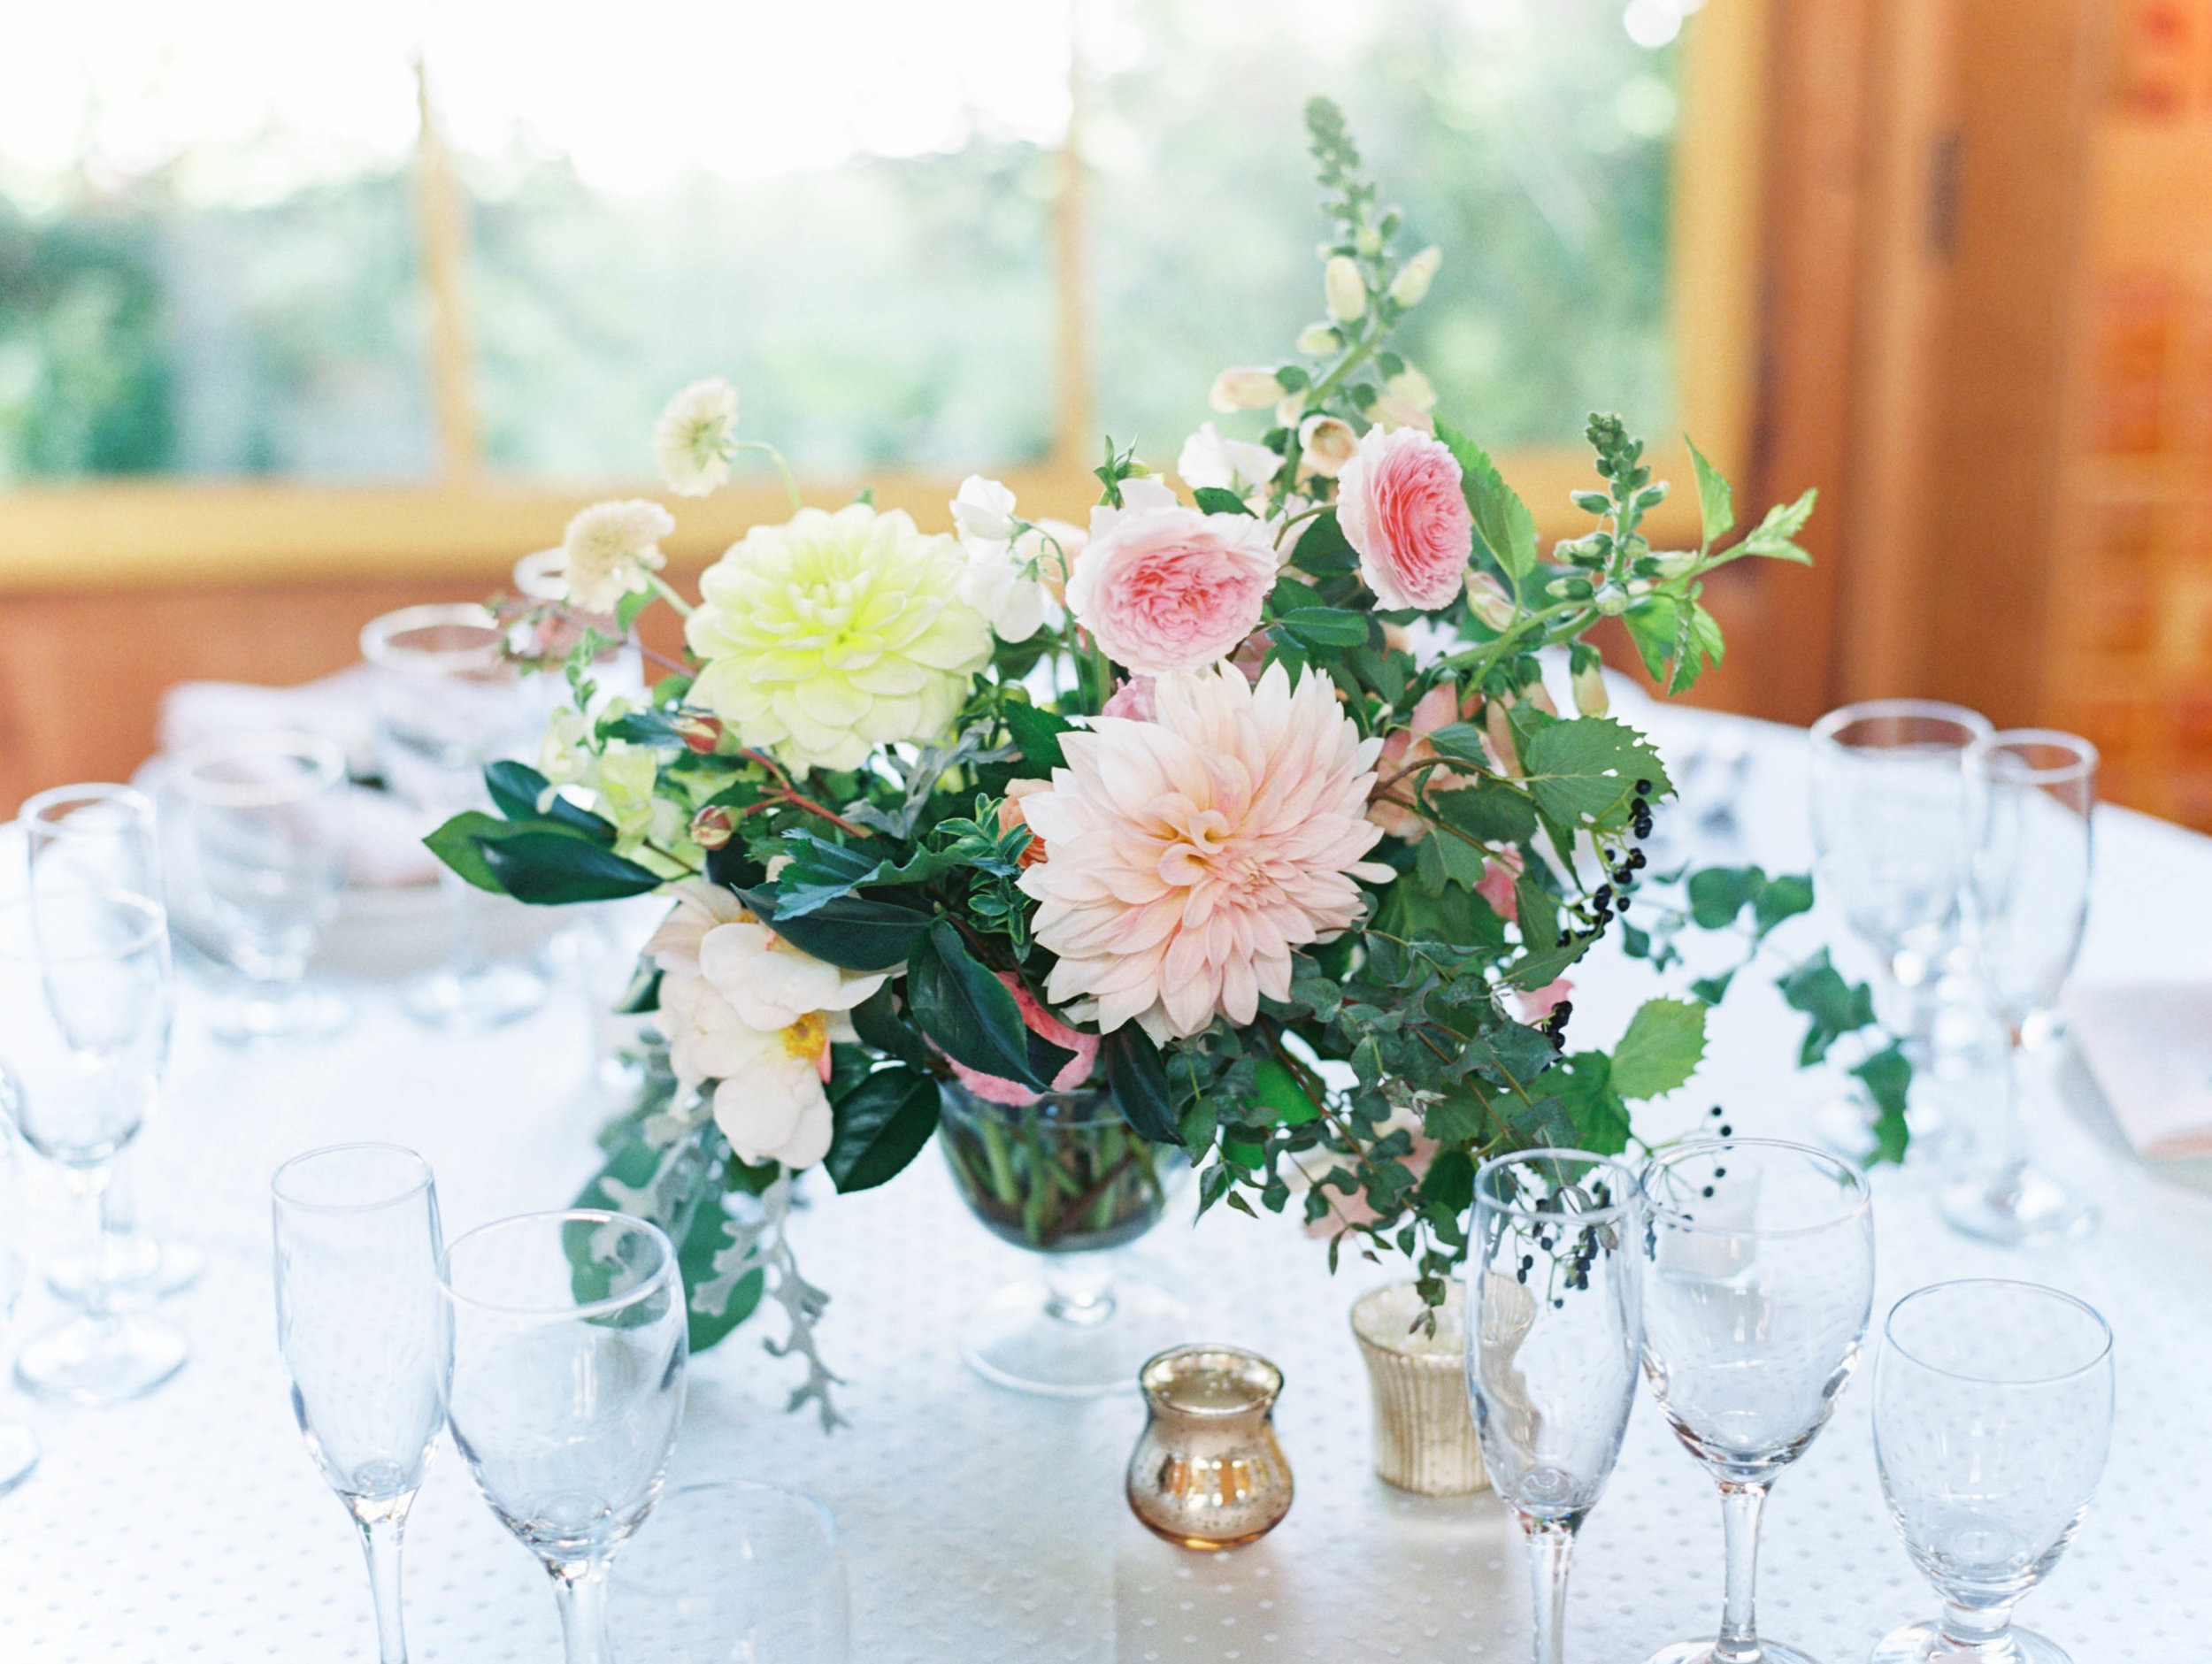 wedding flower centerpiece design with dahlias and garden roses in summer at outdoor oregon wedding.jpg